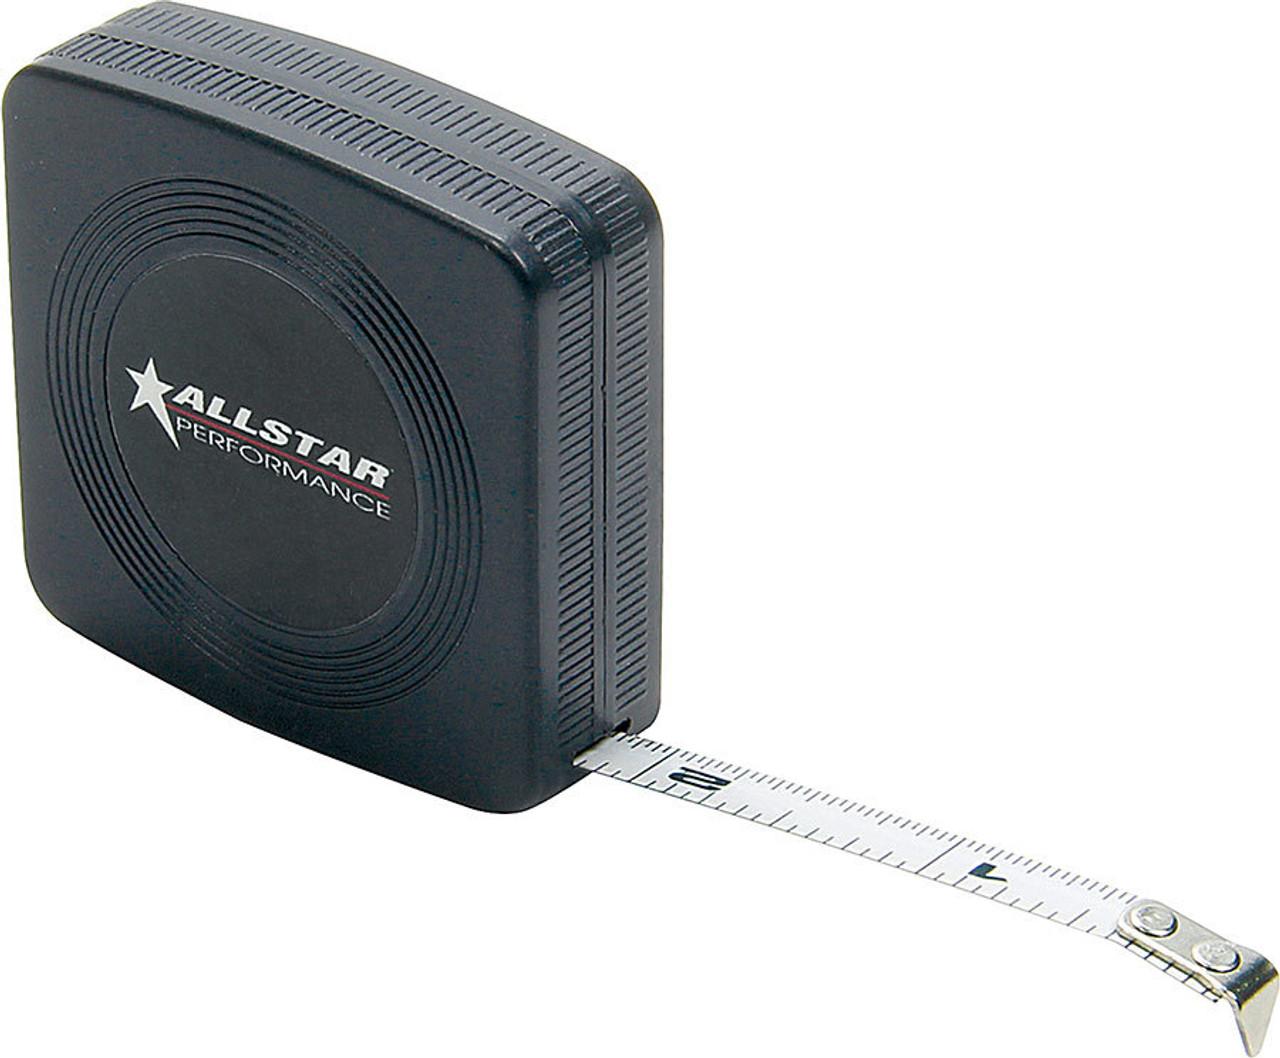 ALLSTAR PERFORMANCE 10112 Tape Measure, Deluxe, 10 ft Length, 1/4 in Width, Inch, Plastic, Black